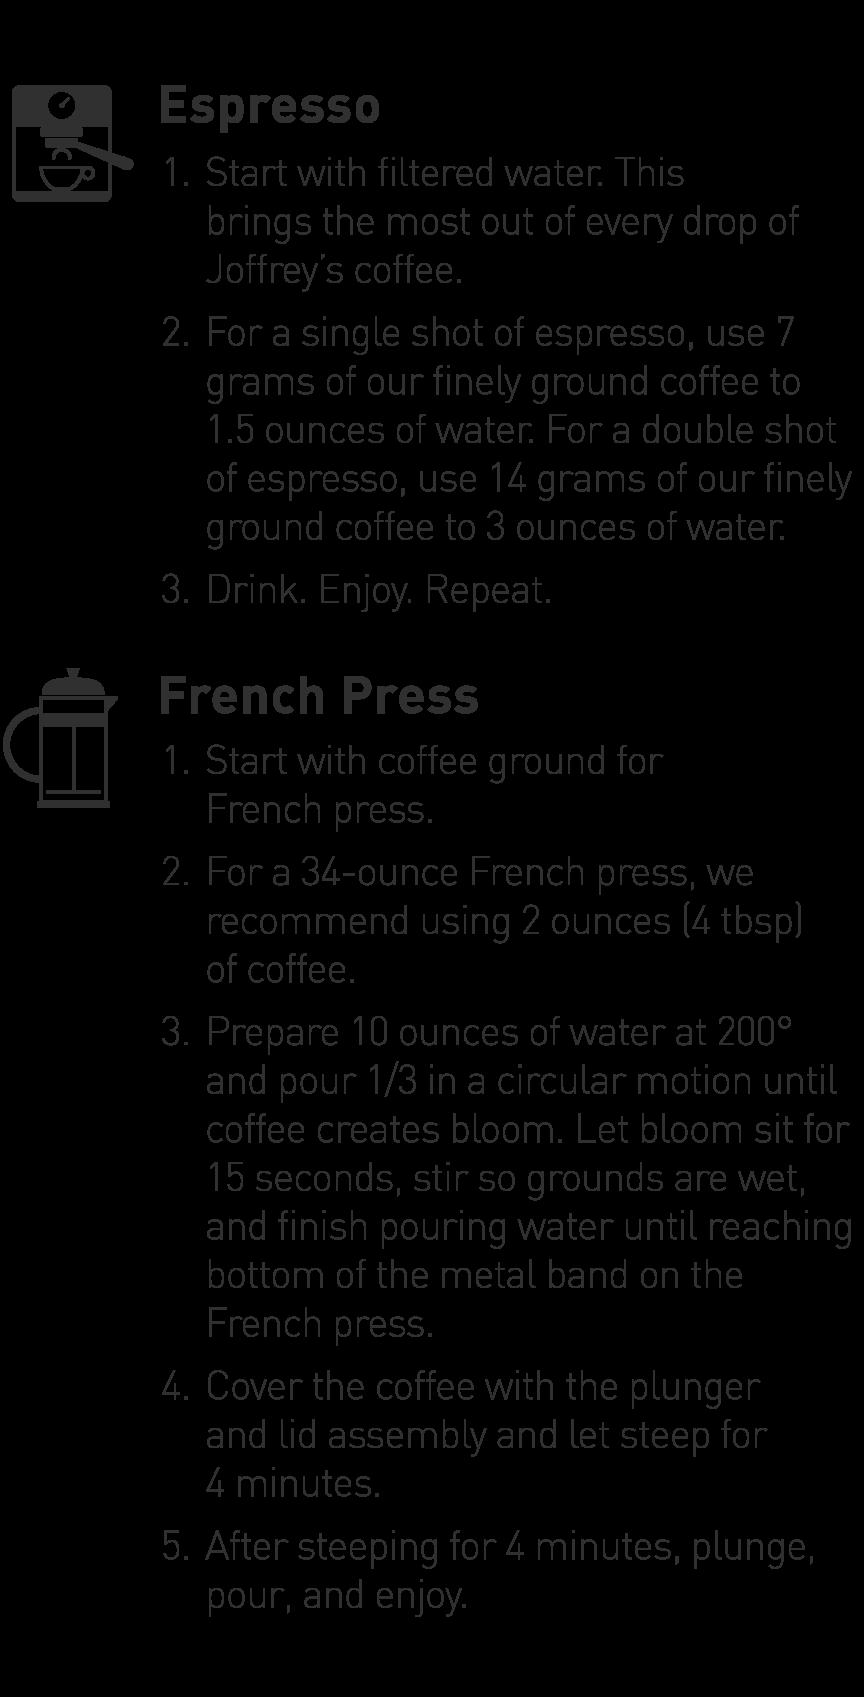 Espresso and French Press Brewing Guide